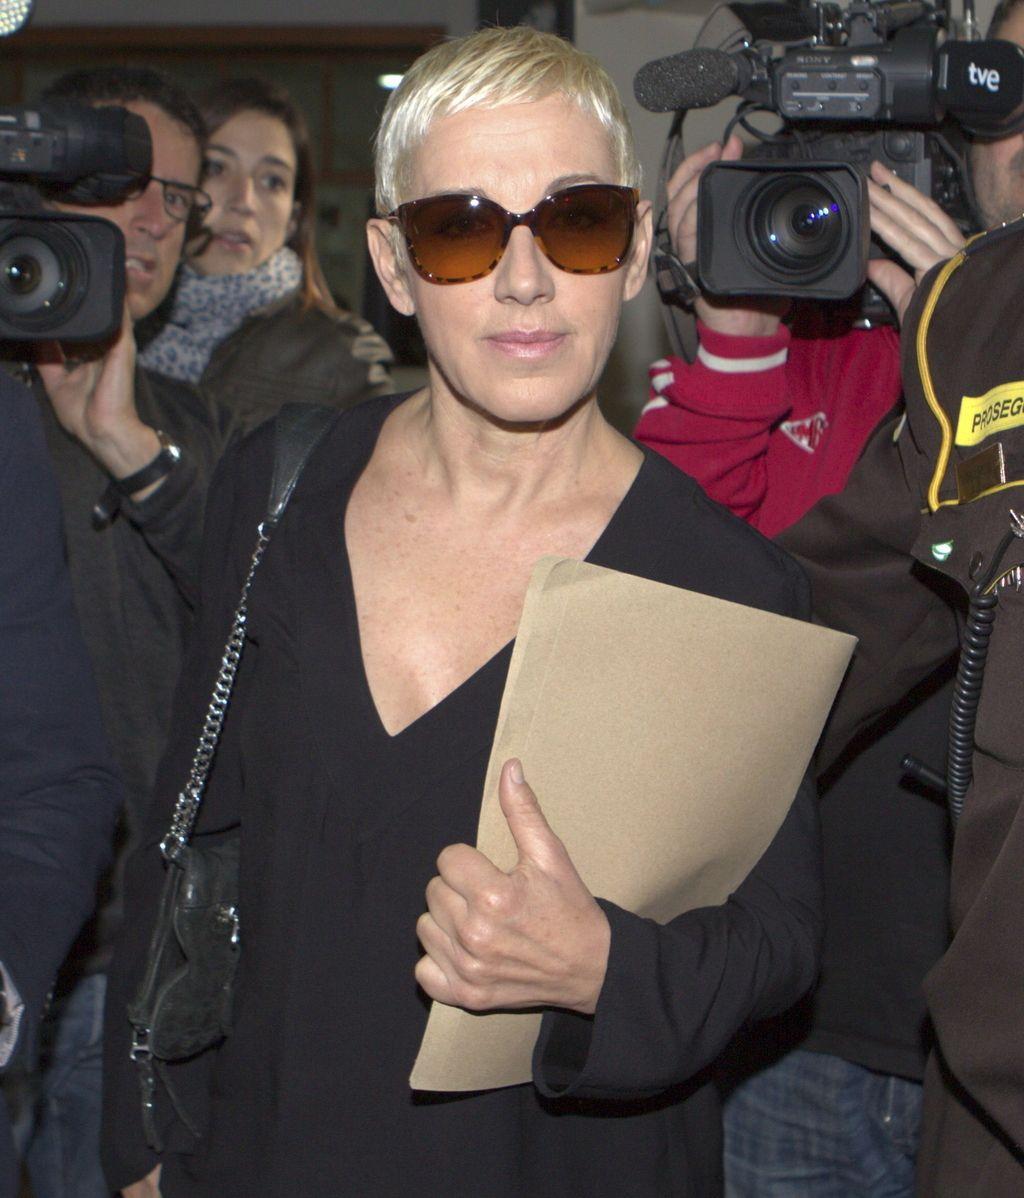 Juicio a Ana Torroja por fraude fiscal